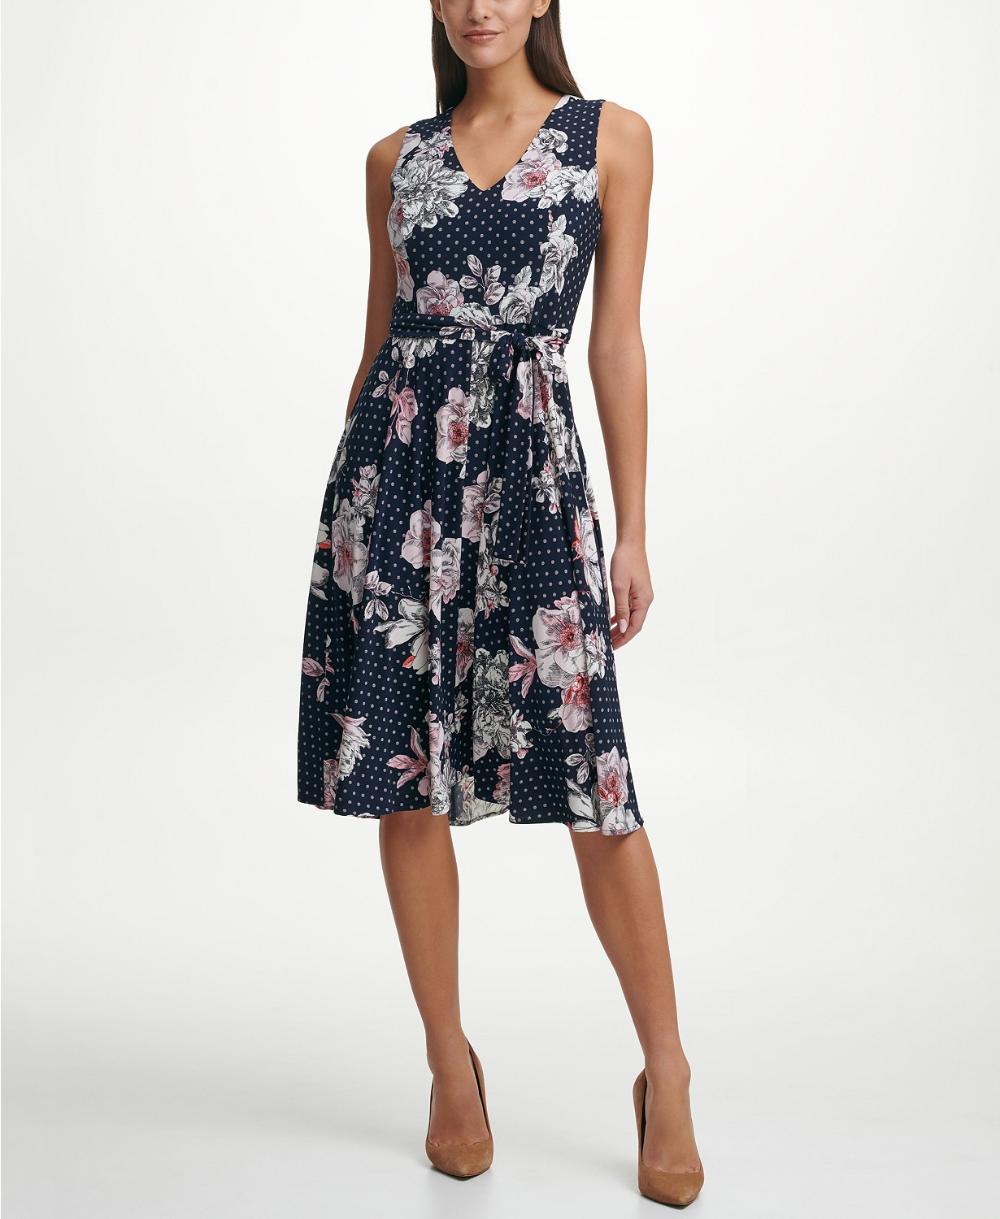 Tommy Hilfiger Bloom Floral Fit Flare Dress Reviews Dresses Women Macy S In 2021 Flare Dress Fit Flare Dress Dresses [ 1219 x 1000 Pixel ]